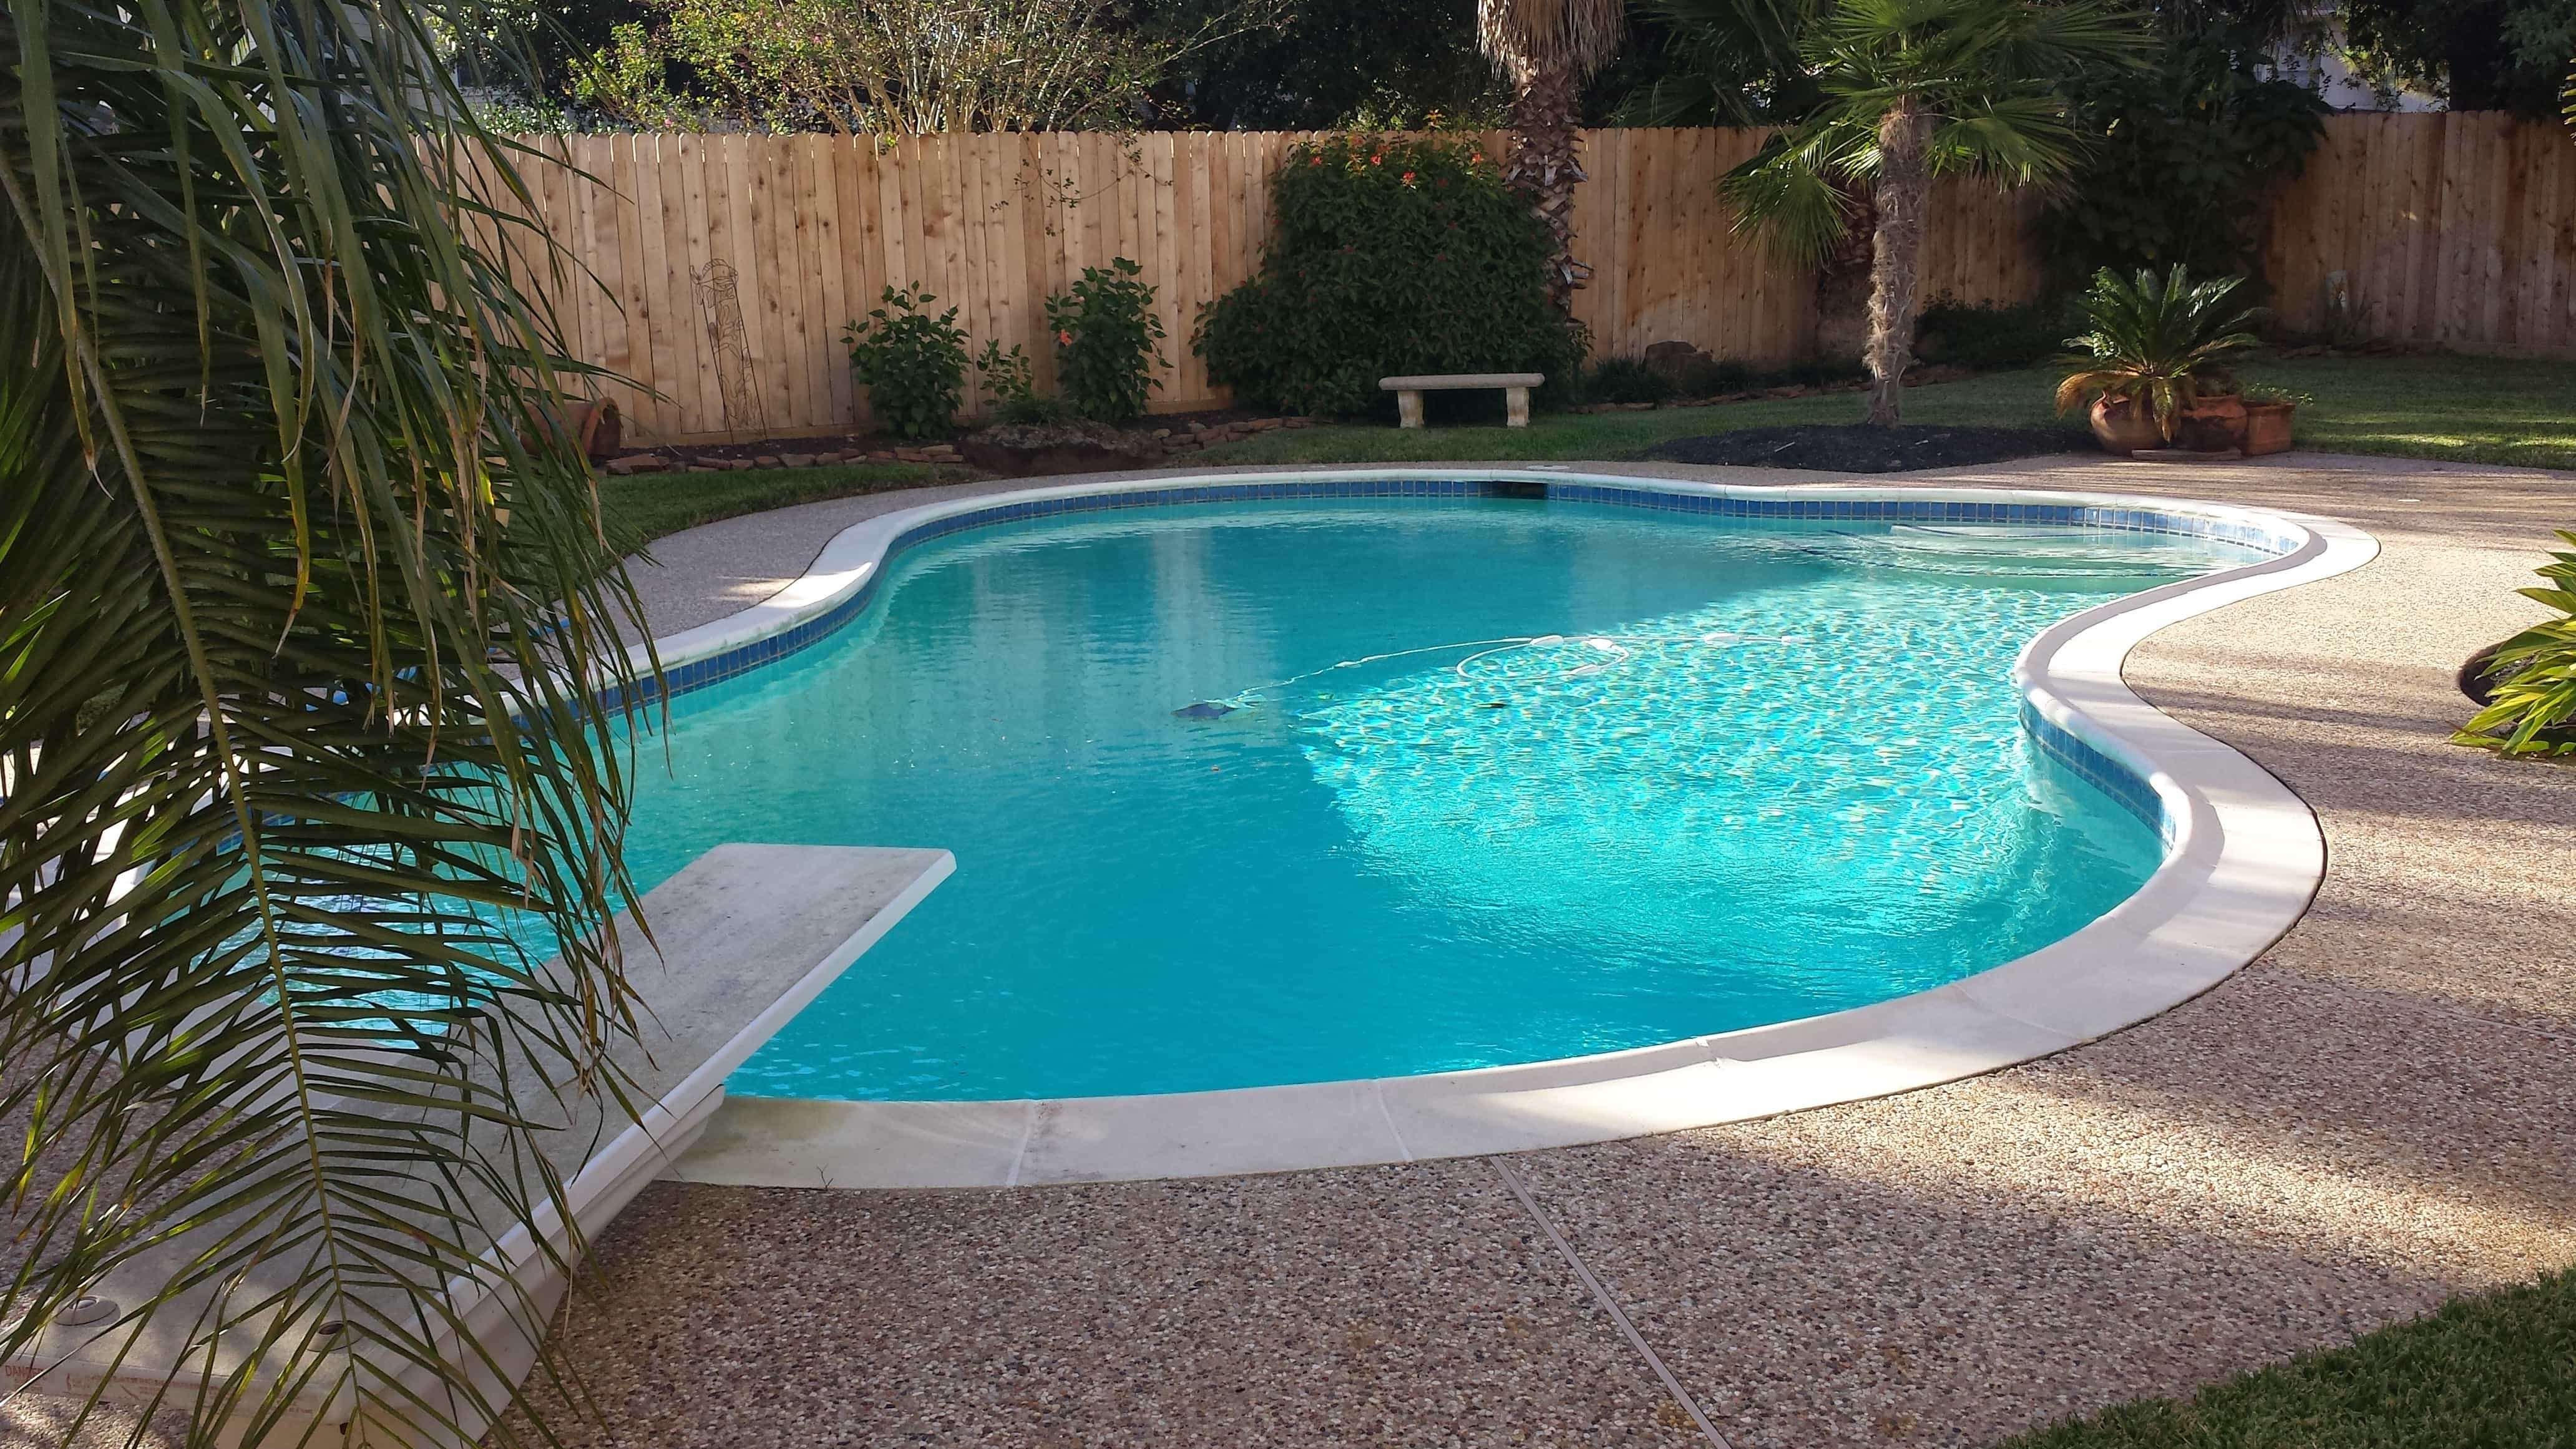 Texas Trophy Pools image 1